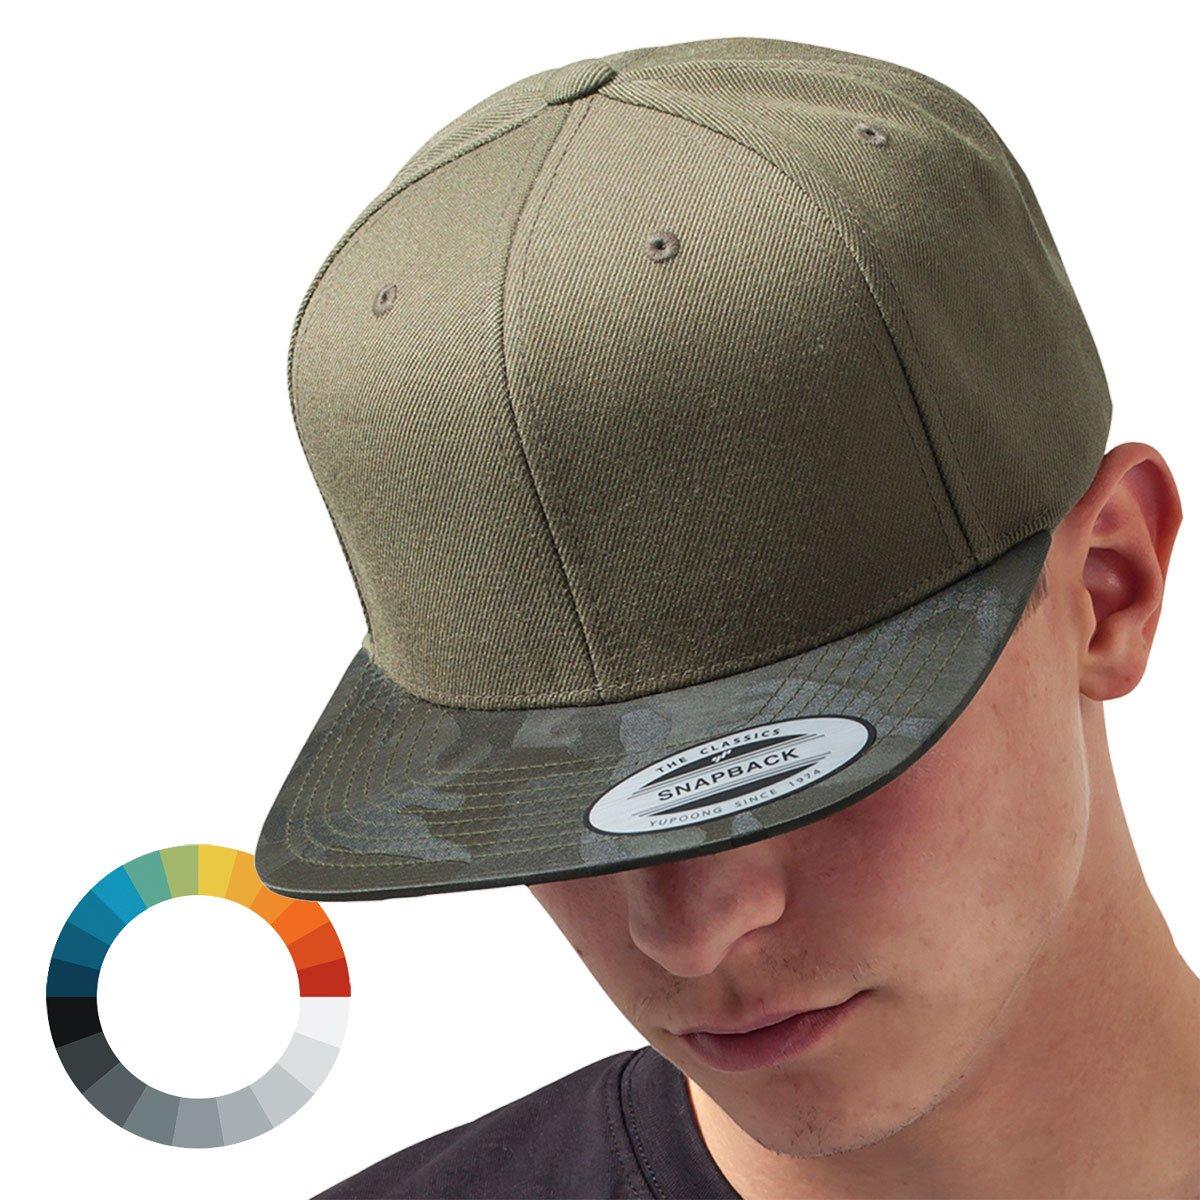 458da88fc74b3 Details about Flexfit CAMO VISOR Snapback Army Cap